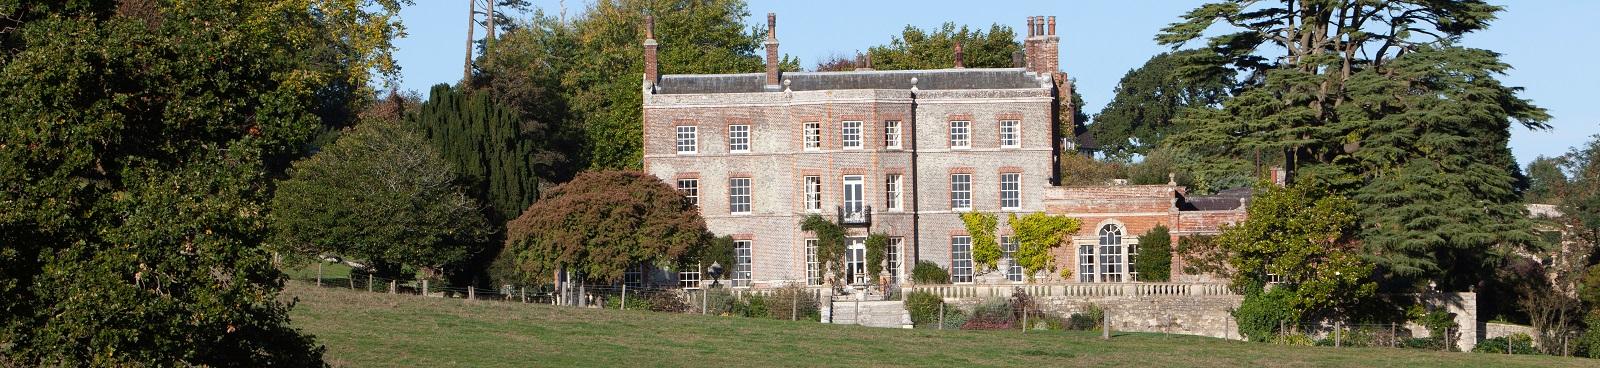 Nunwell House East Wing